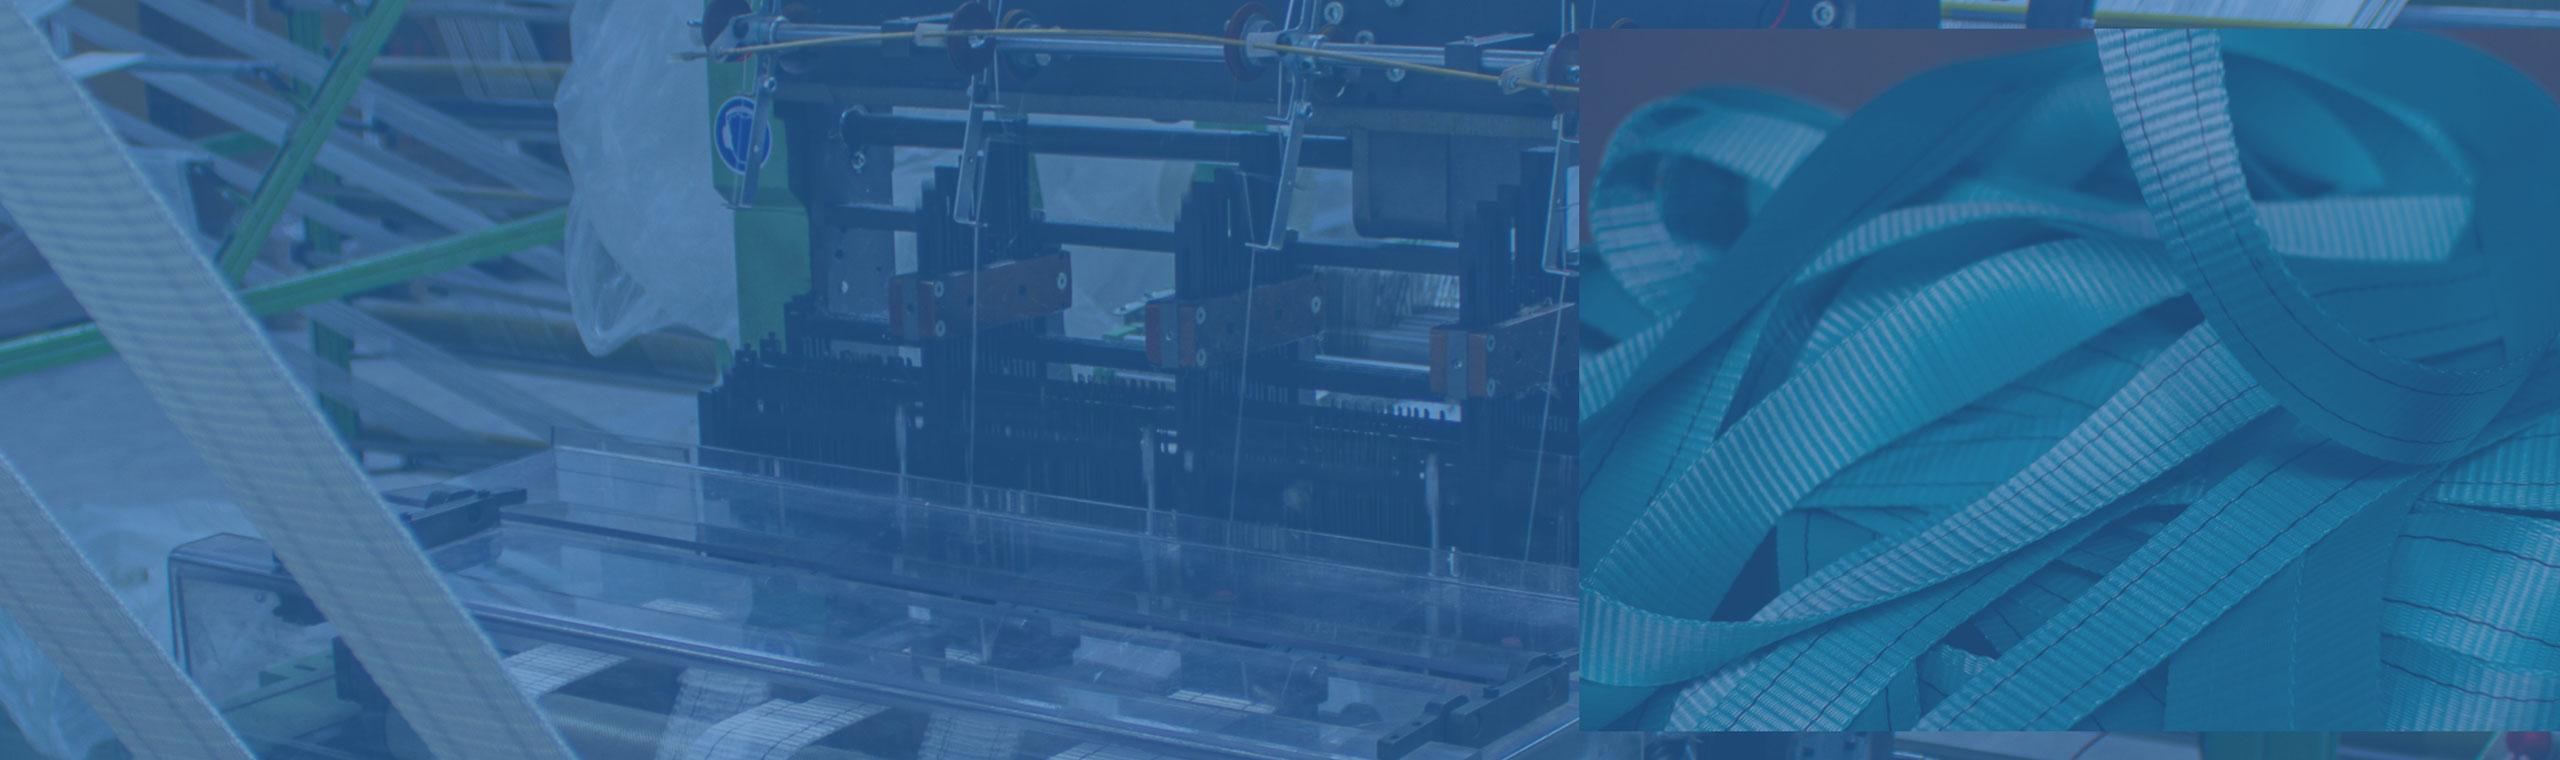 Webbing Sling Manufacture